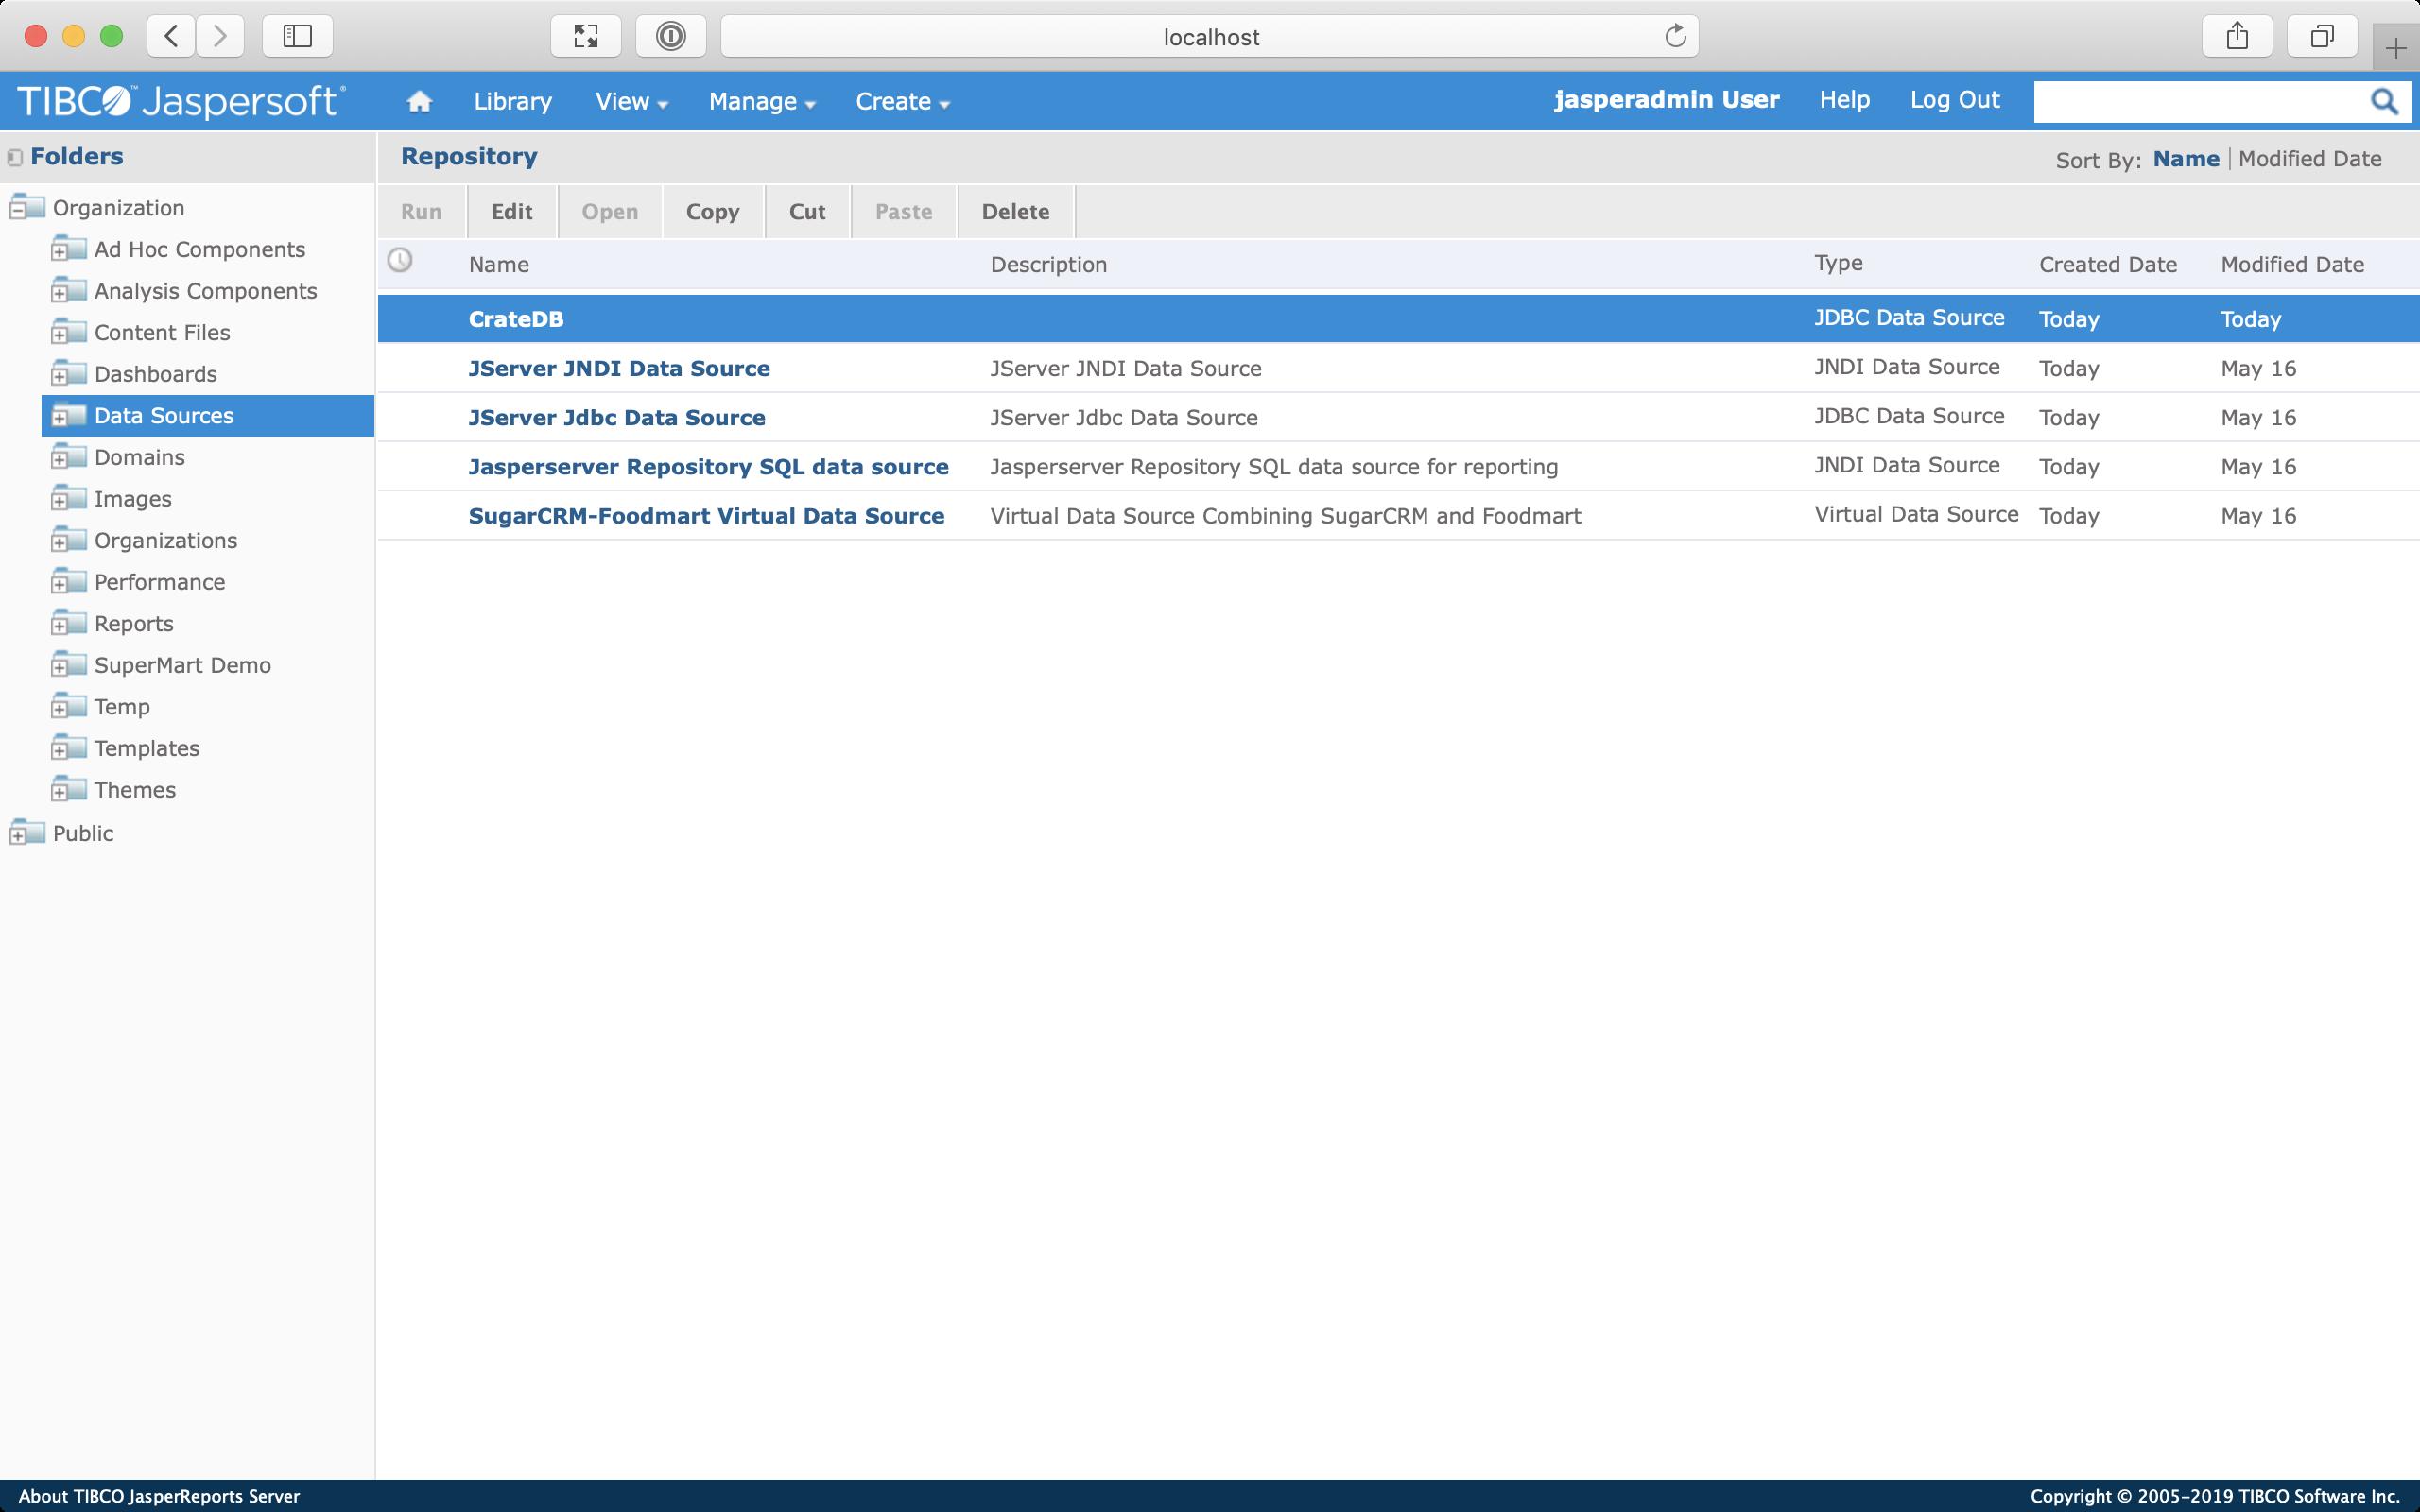 Screenshot of the Repository screen